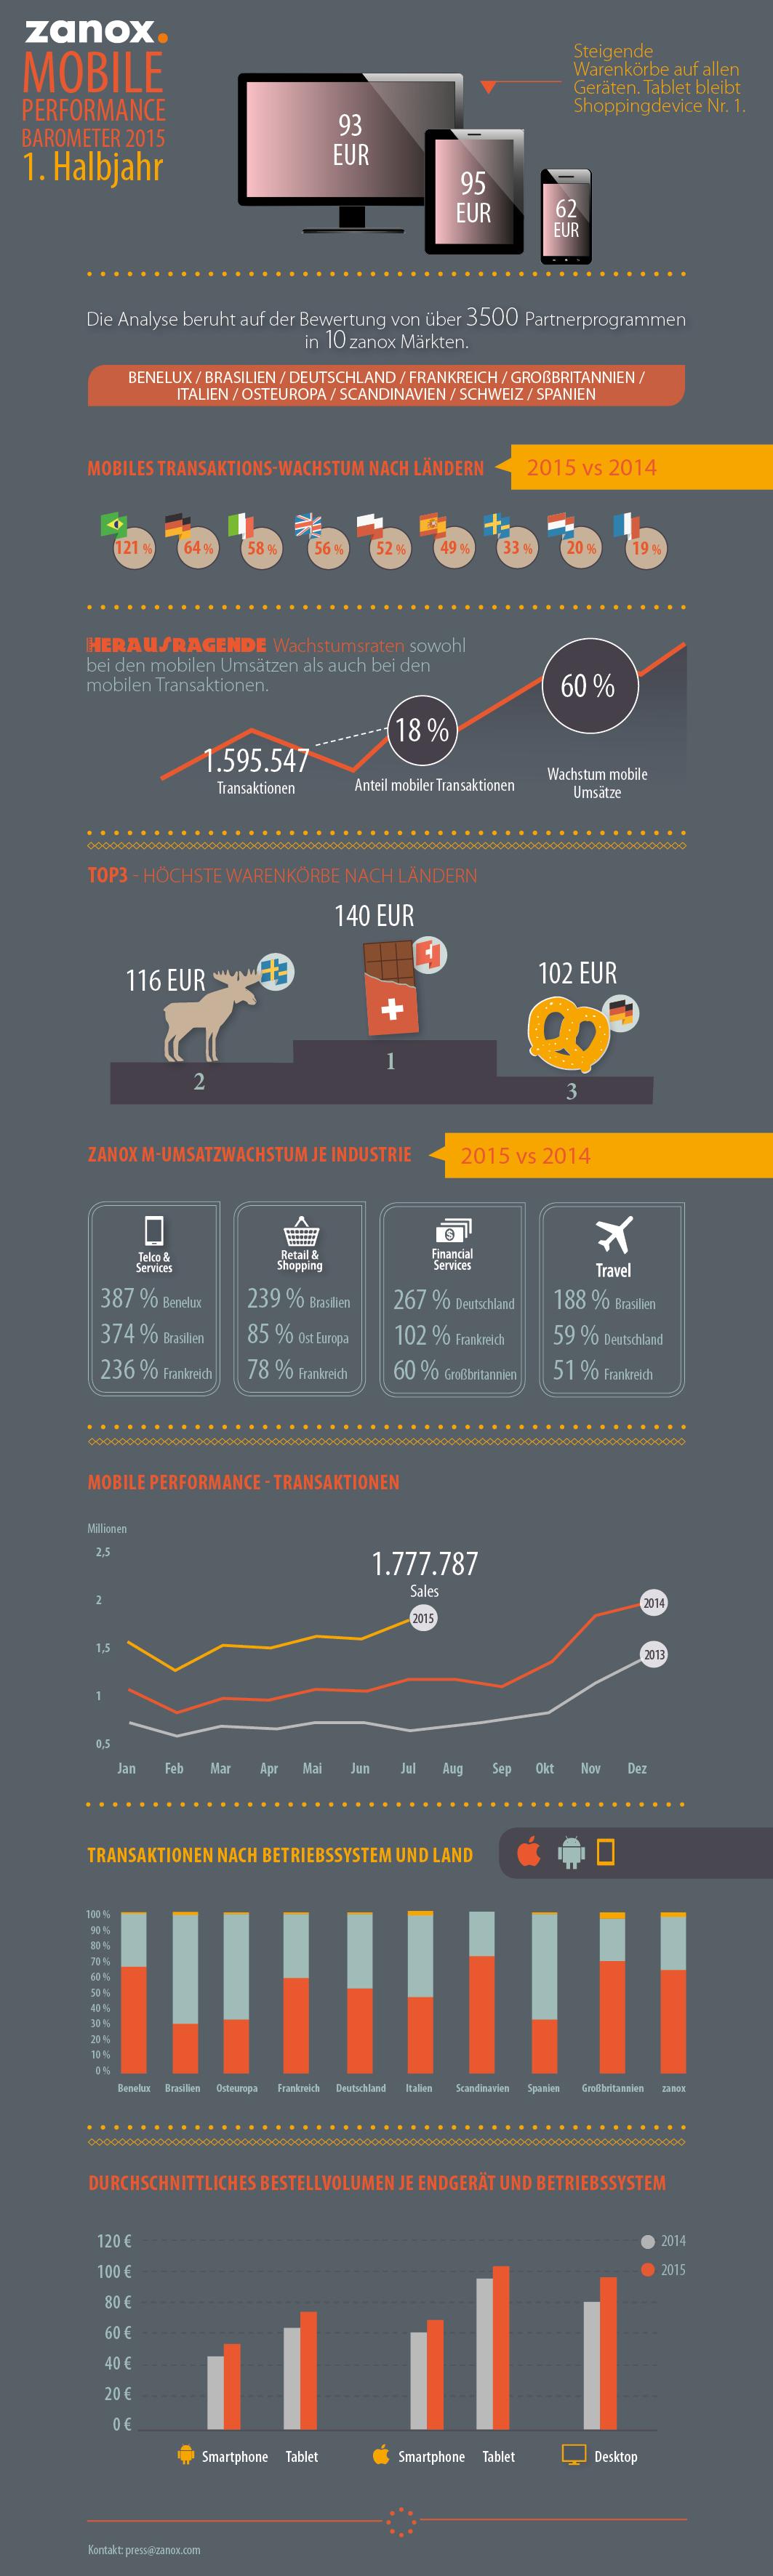 zanox-infographic-mobile-performance-barometer-Sep2015-DE